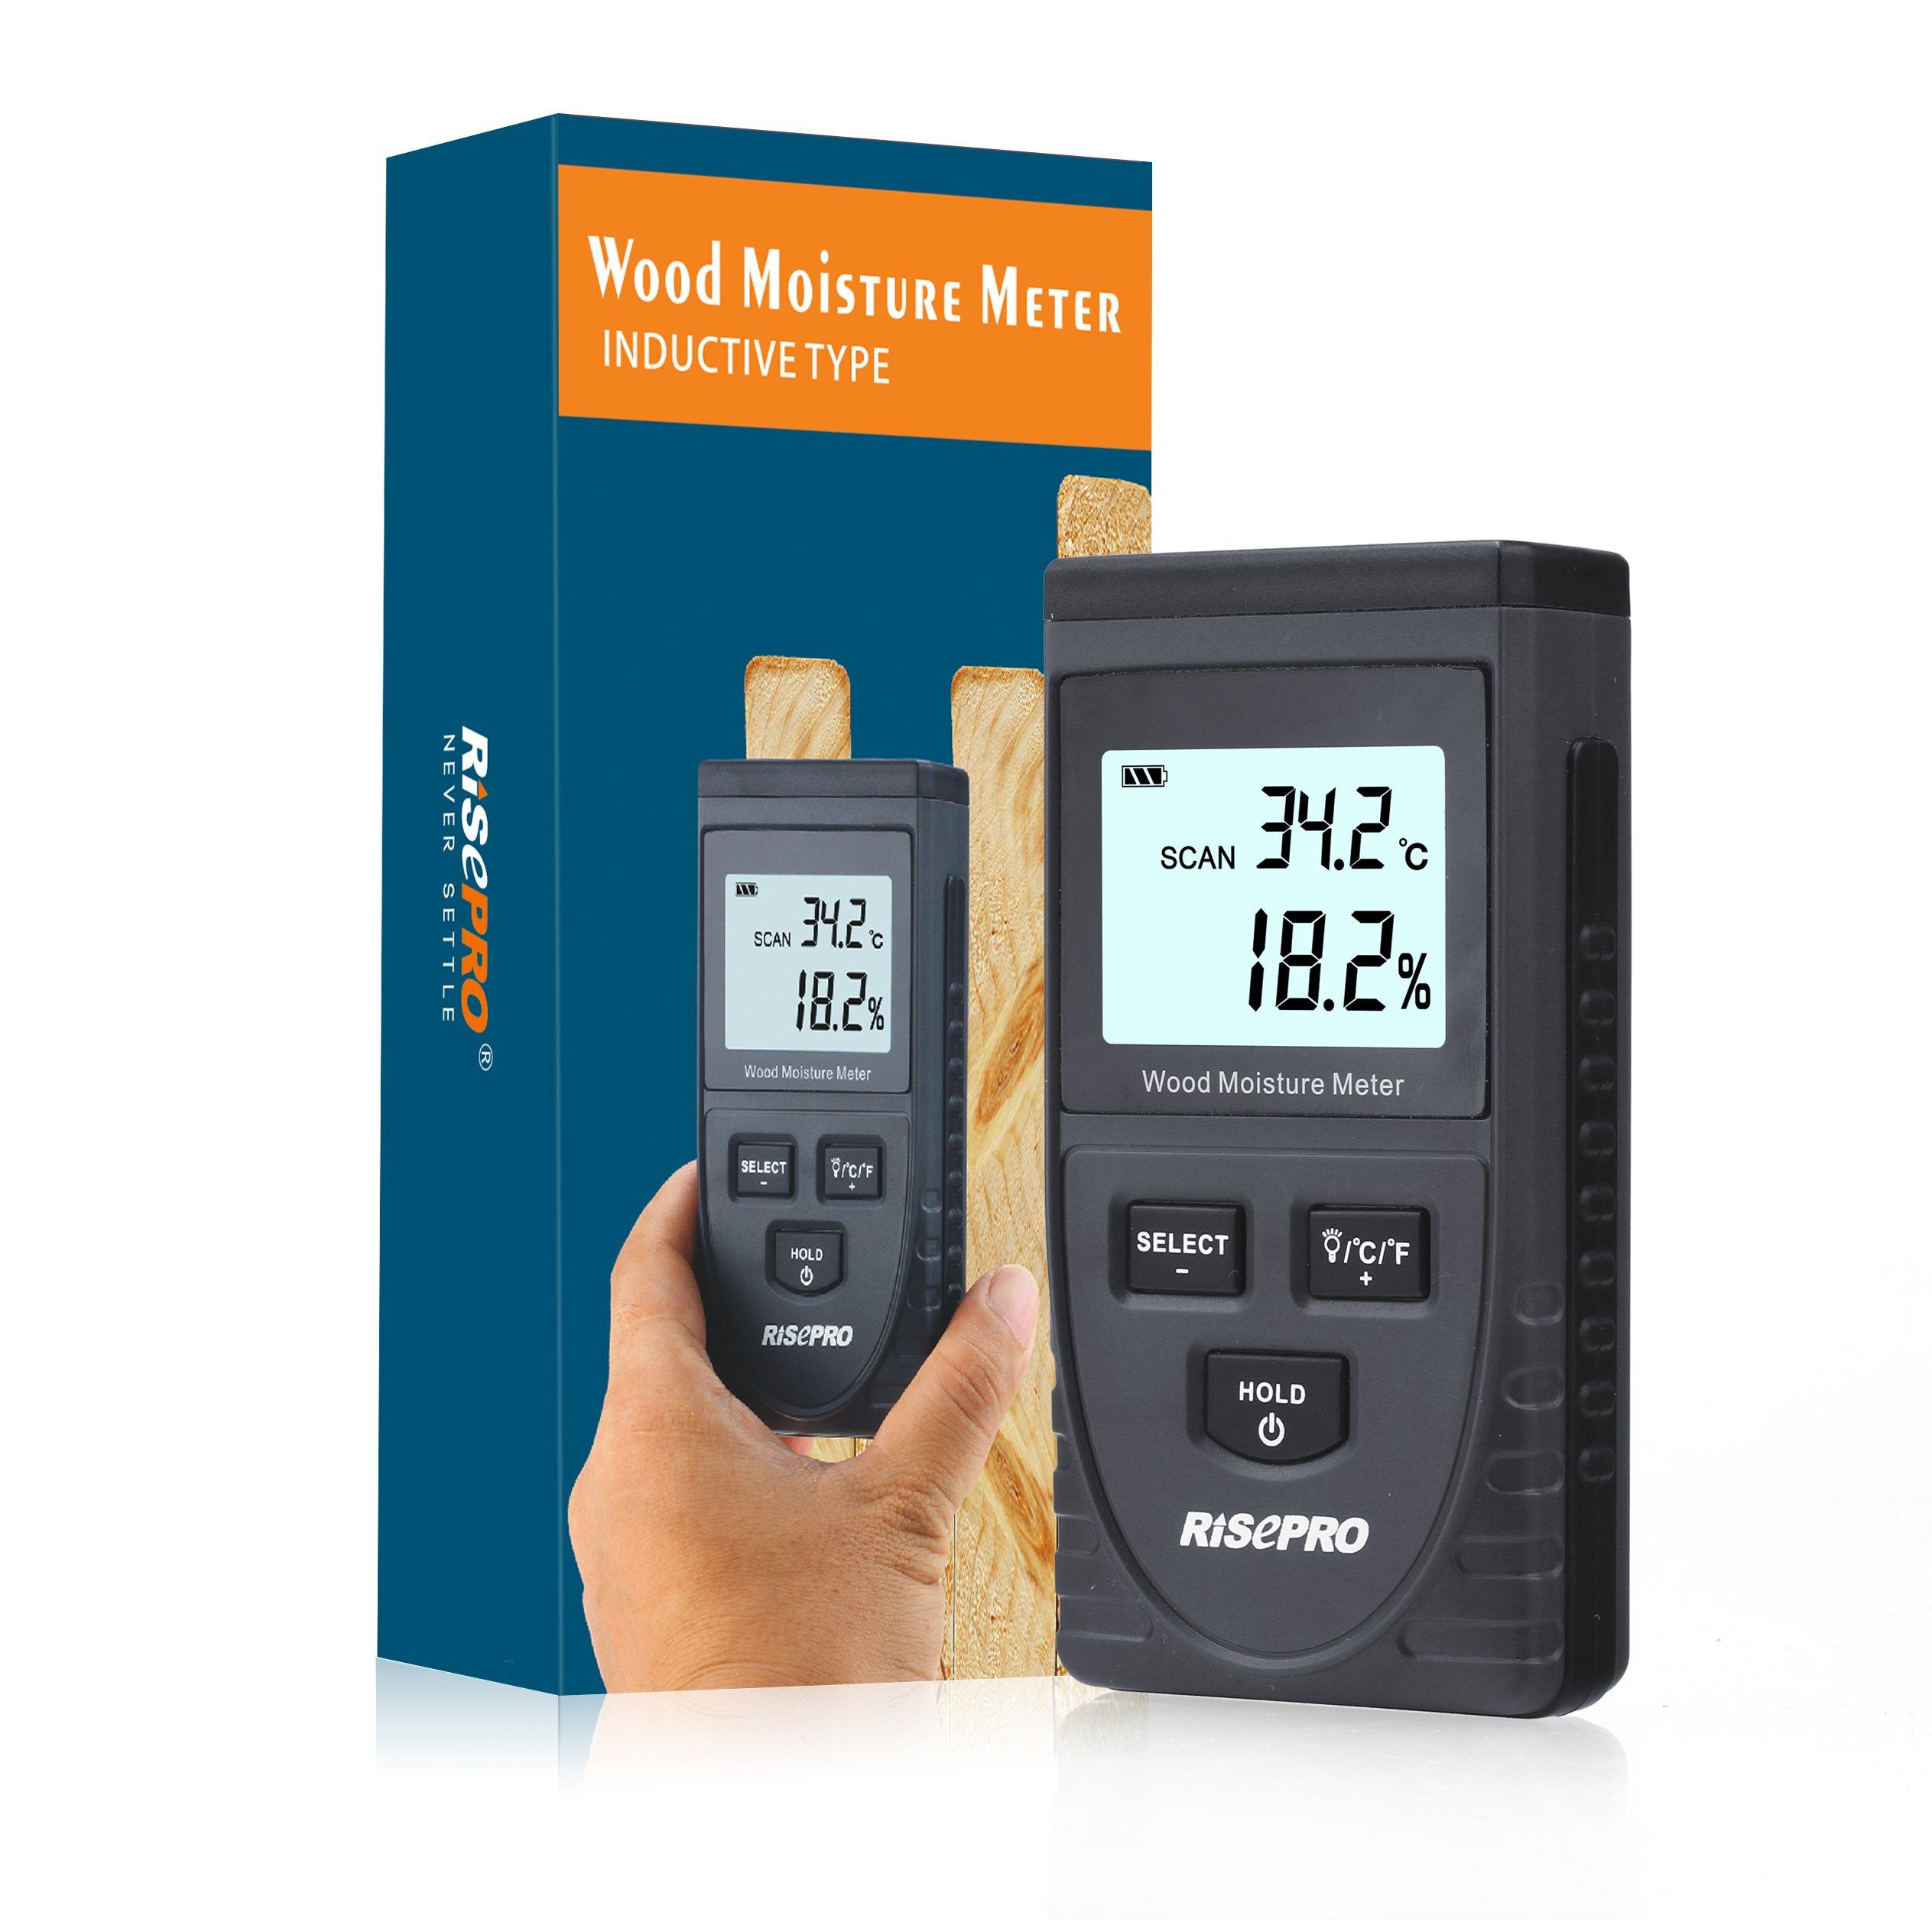 Wood Moisture Meter, RISEPRO Digital Moisture Meter Non-Invasive Inductive Wood Moisture Tester Water Content GM630